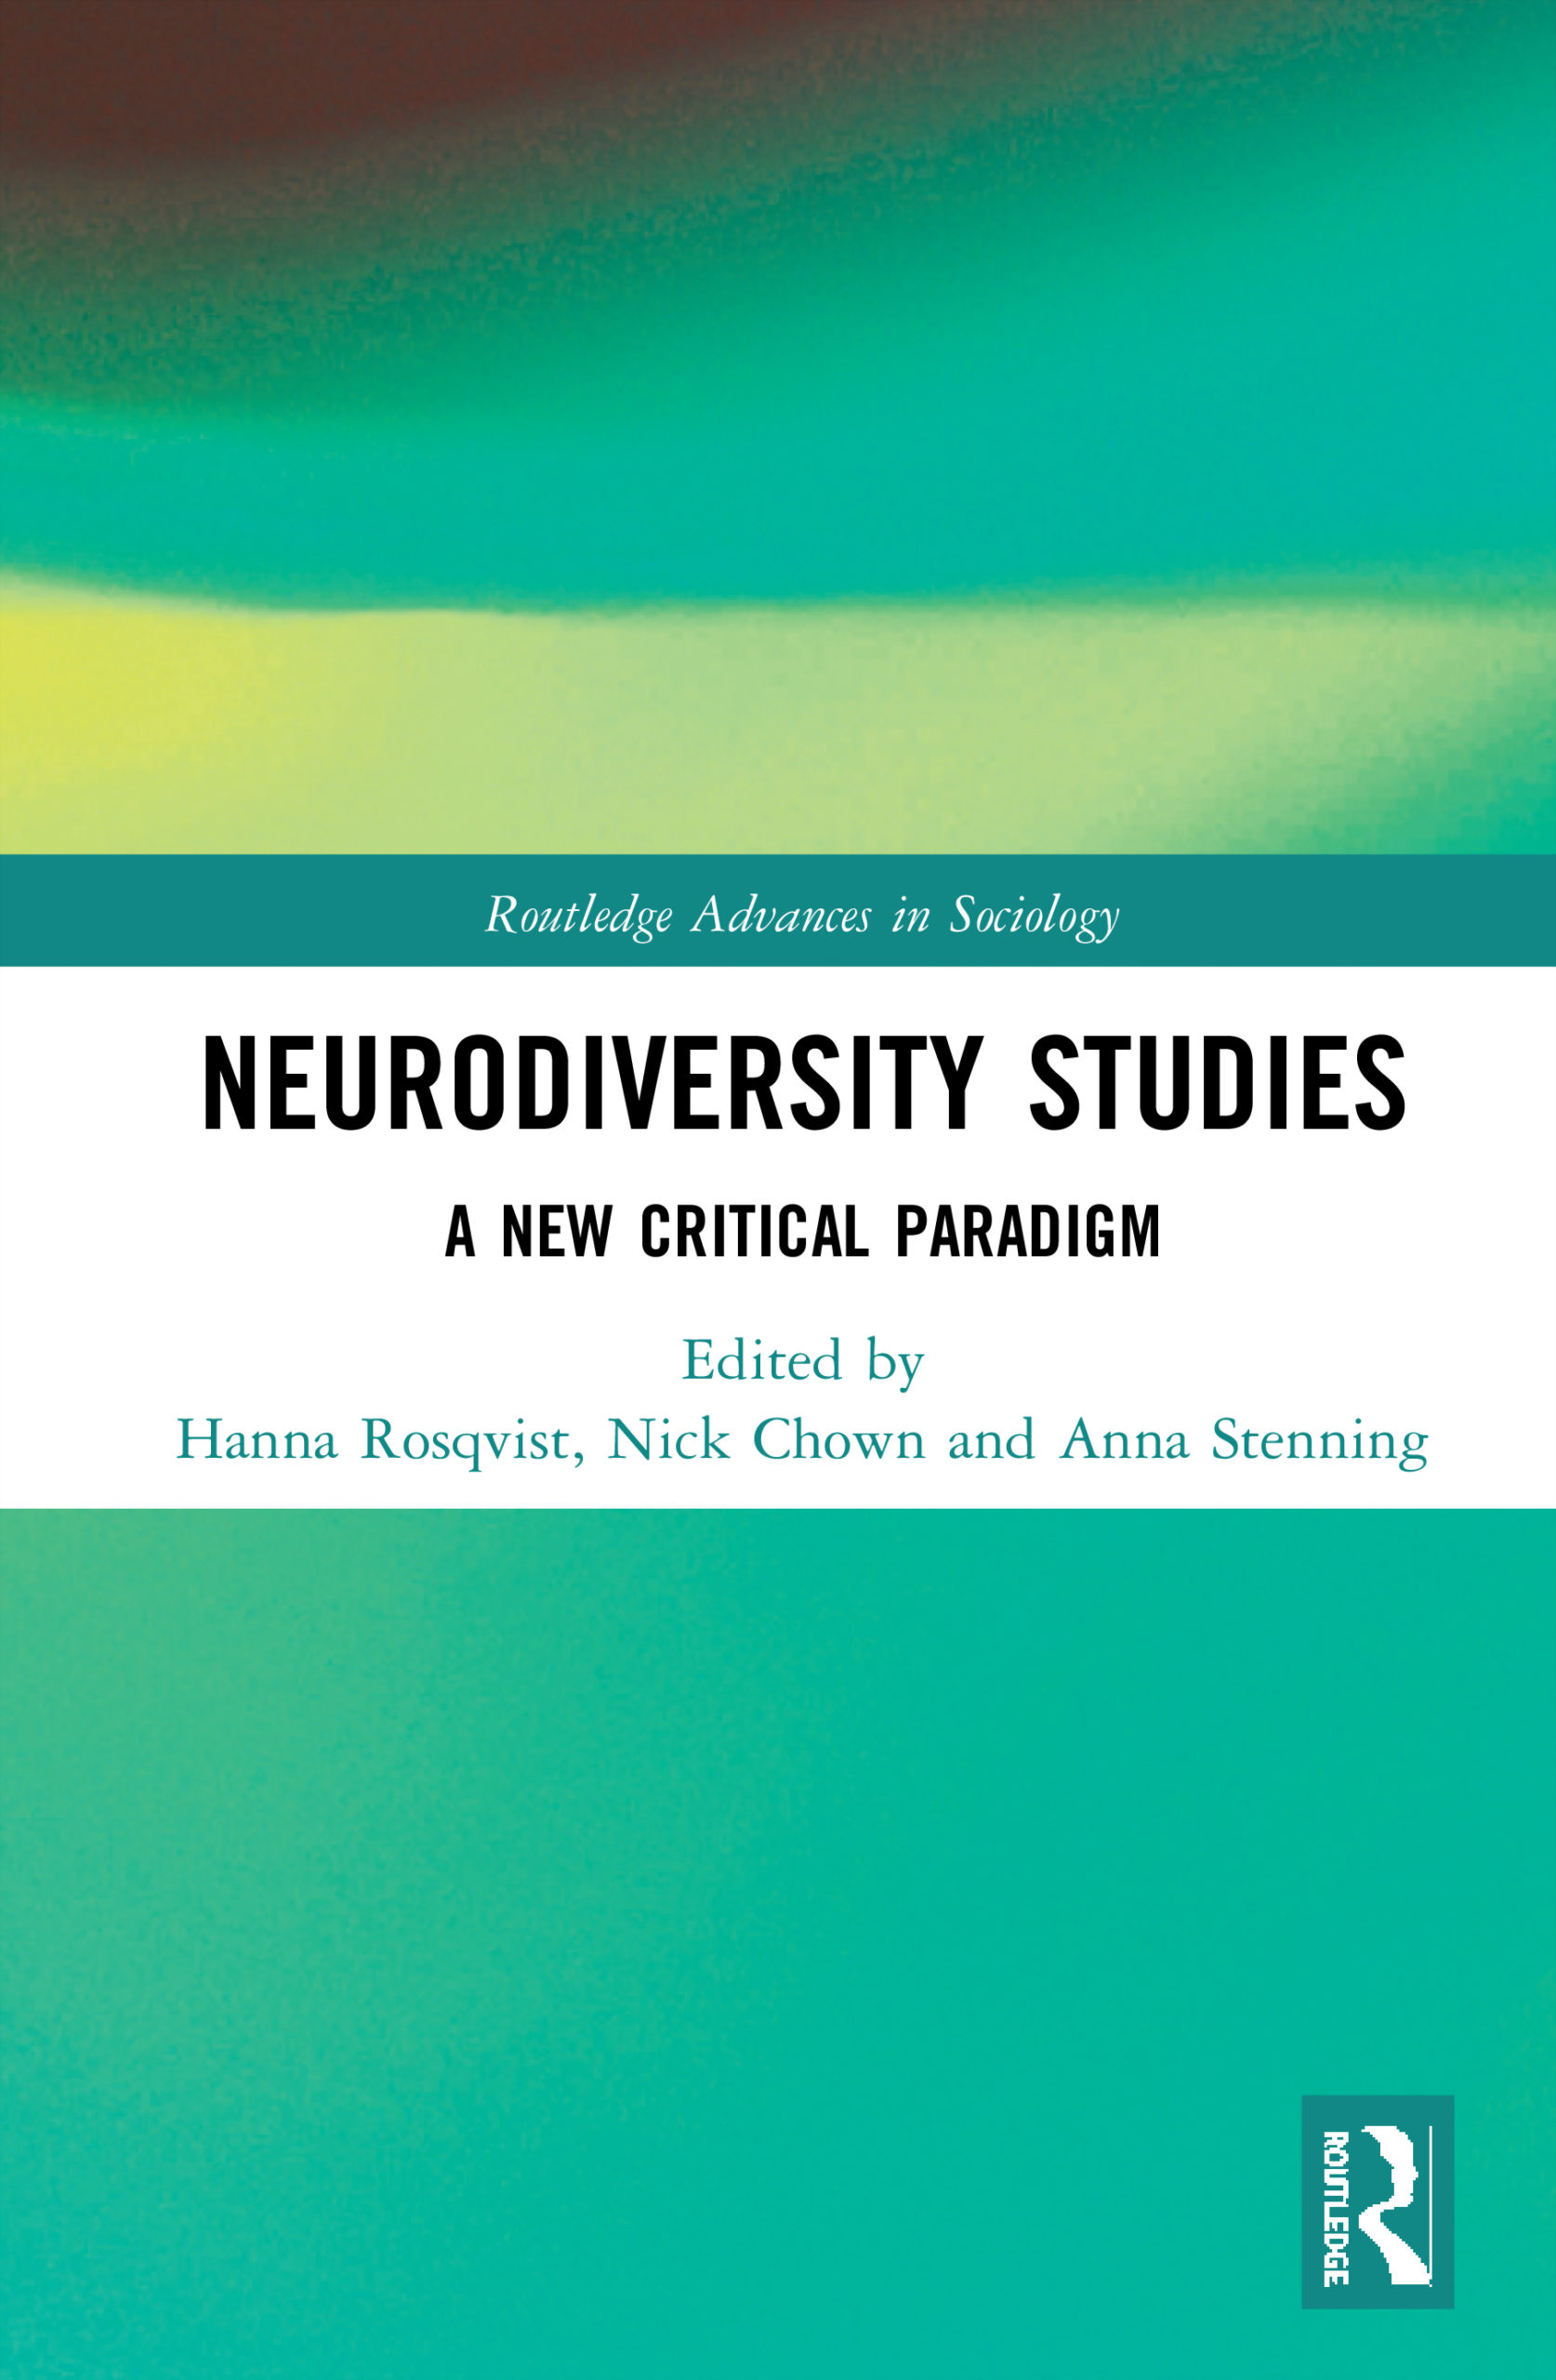 Neurodiversity Studies: ANew Critical Paradigm